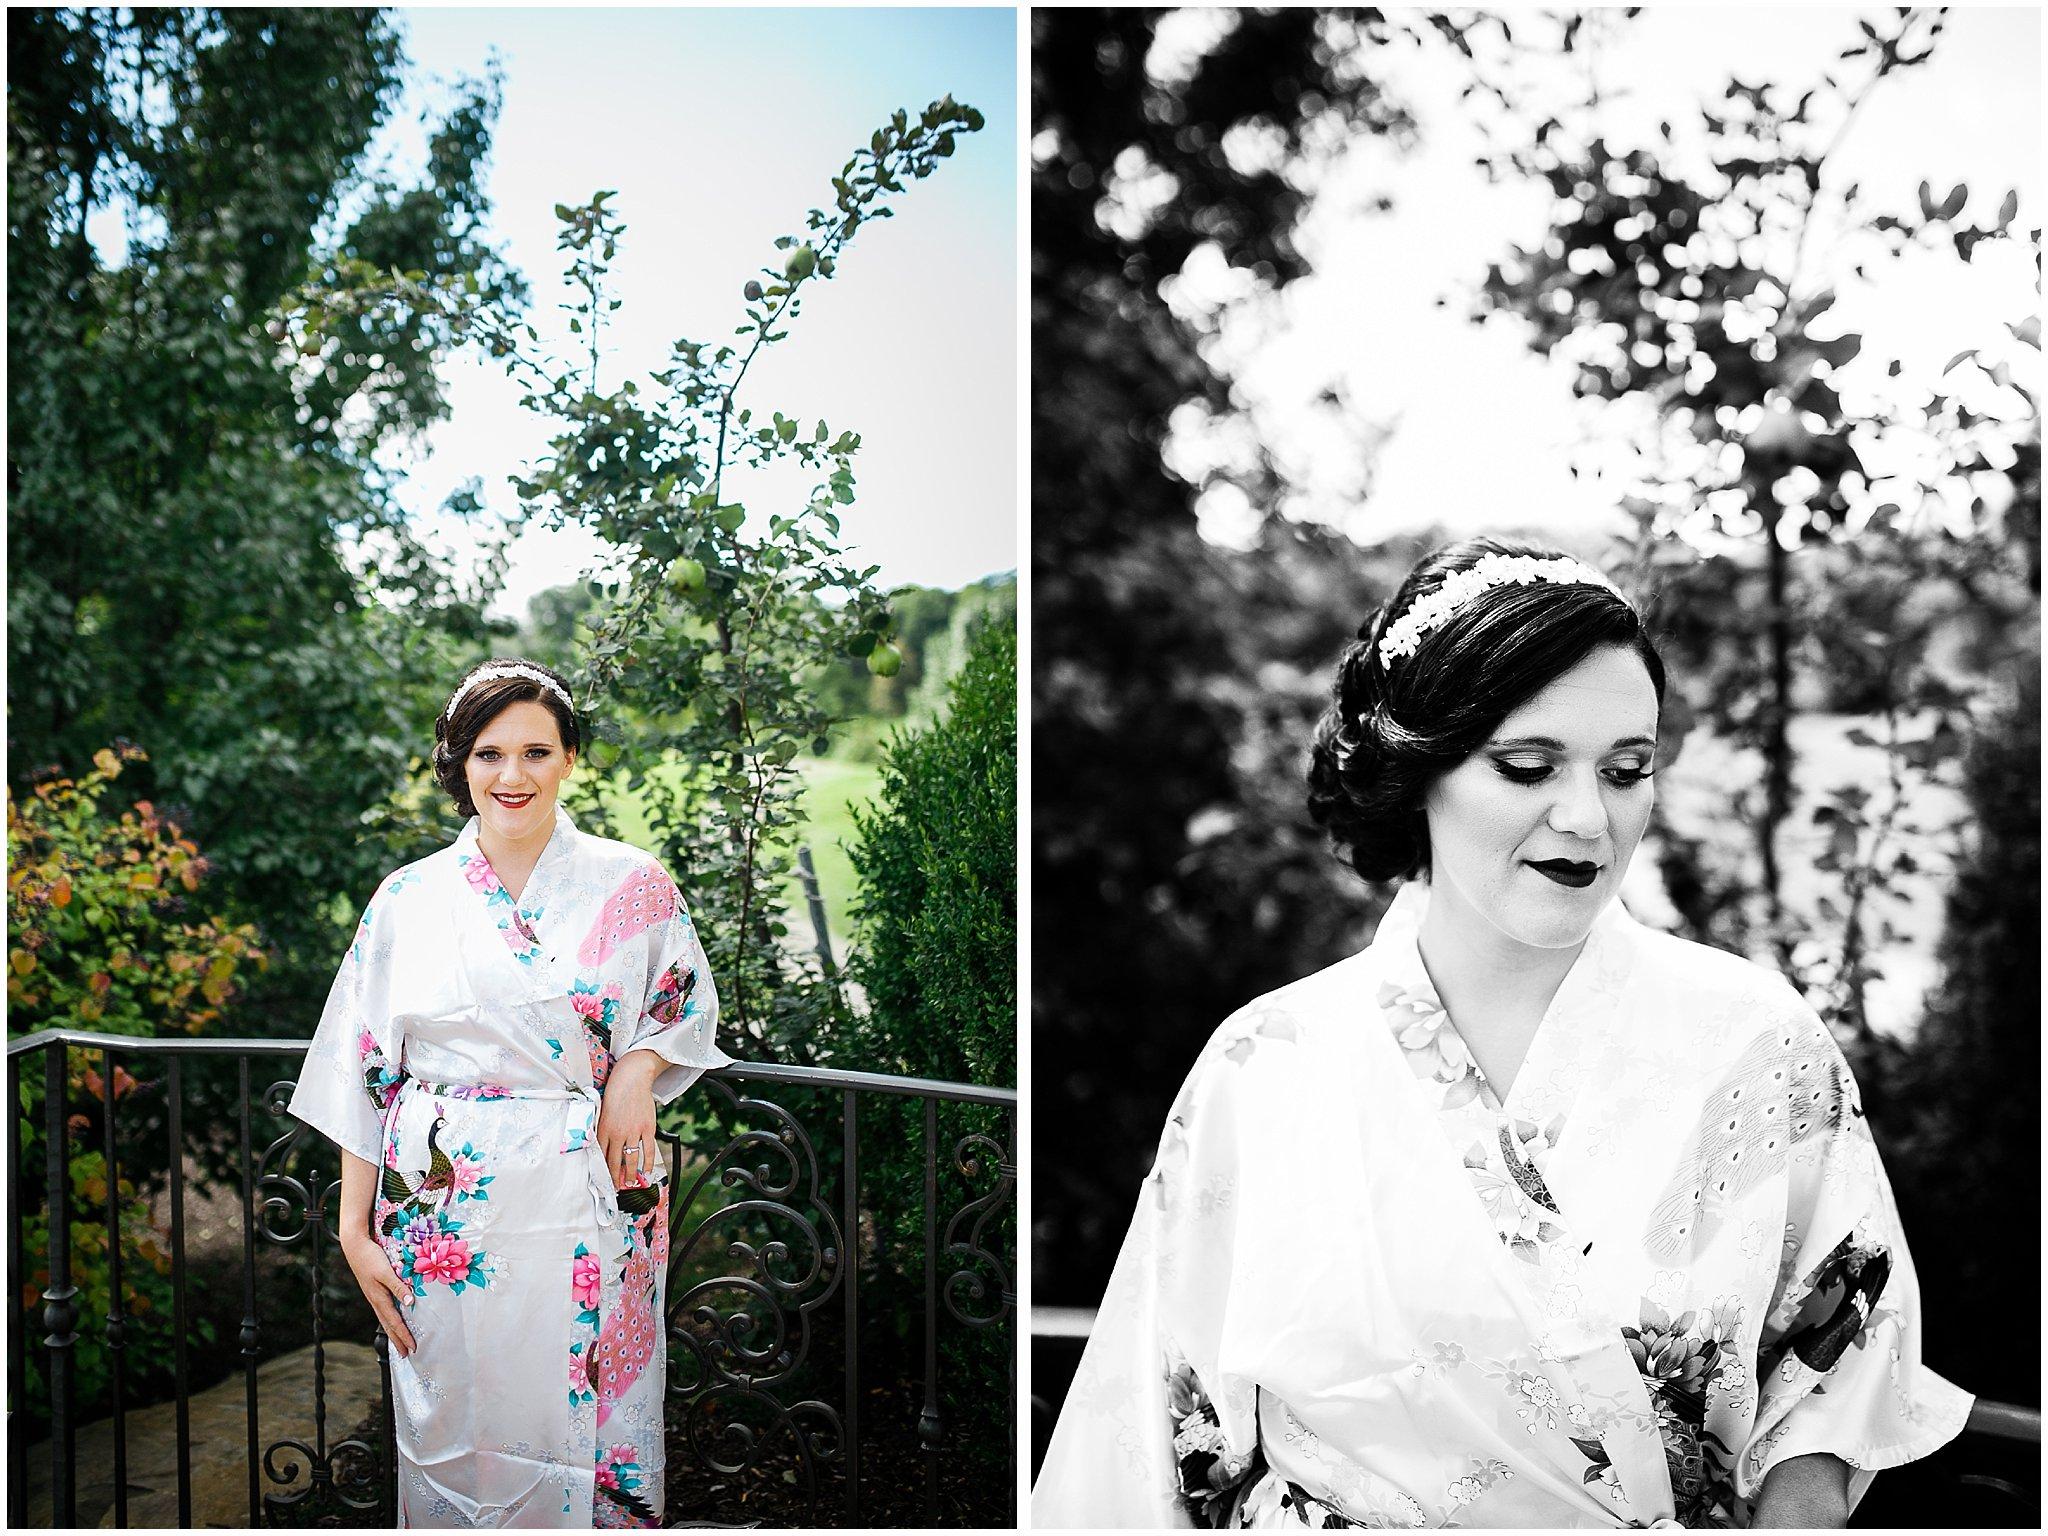 West Hills Country Club Wedding Gatsby Wedding Roaring Twenties Wedding Hudson Valley Wedding Photographer Sweet Alice Photography8.jpg